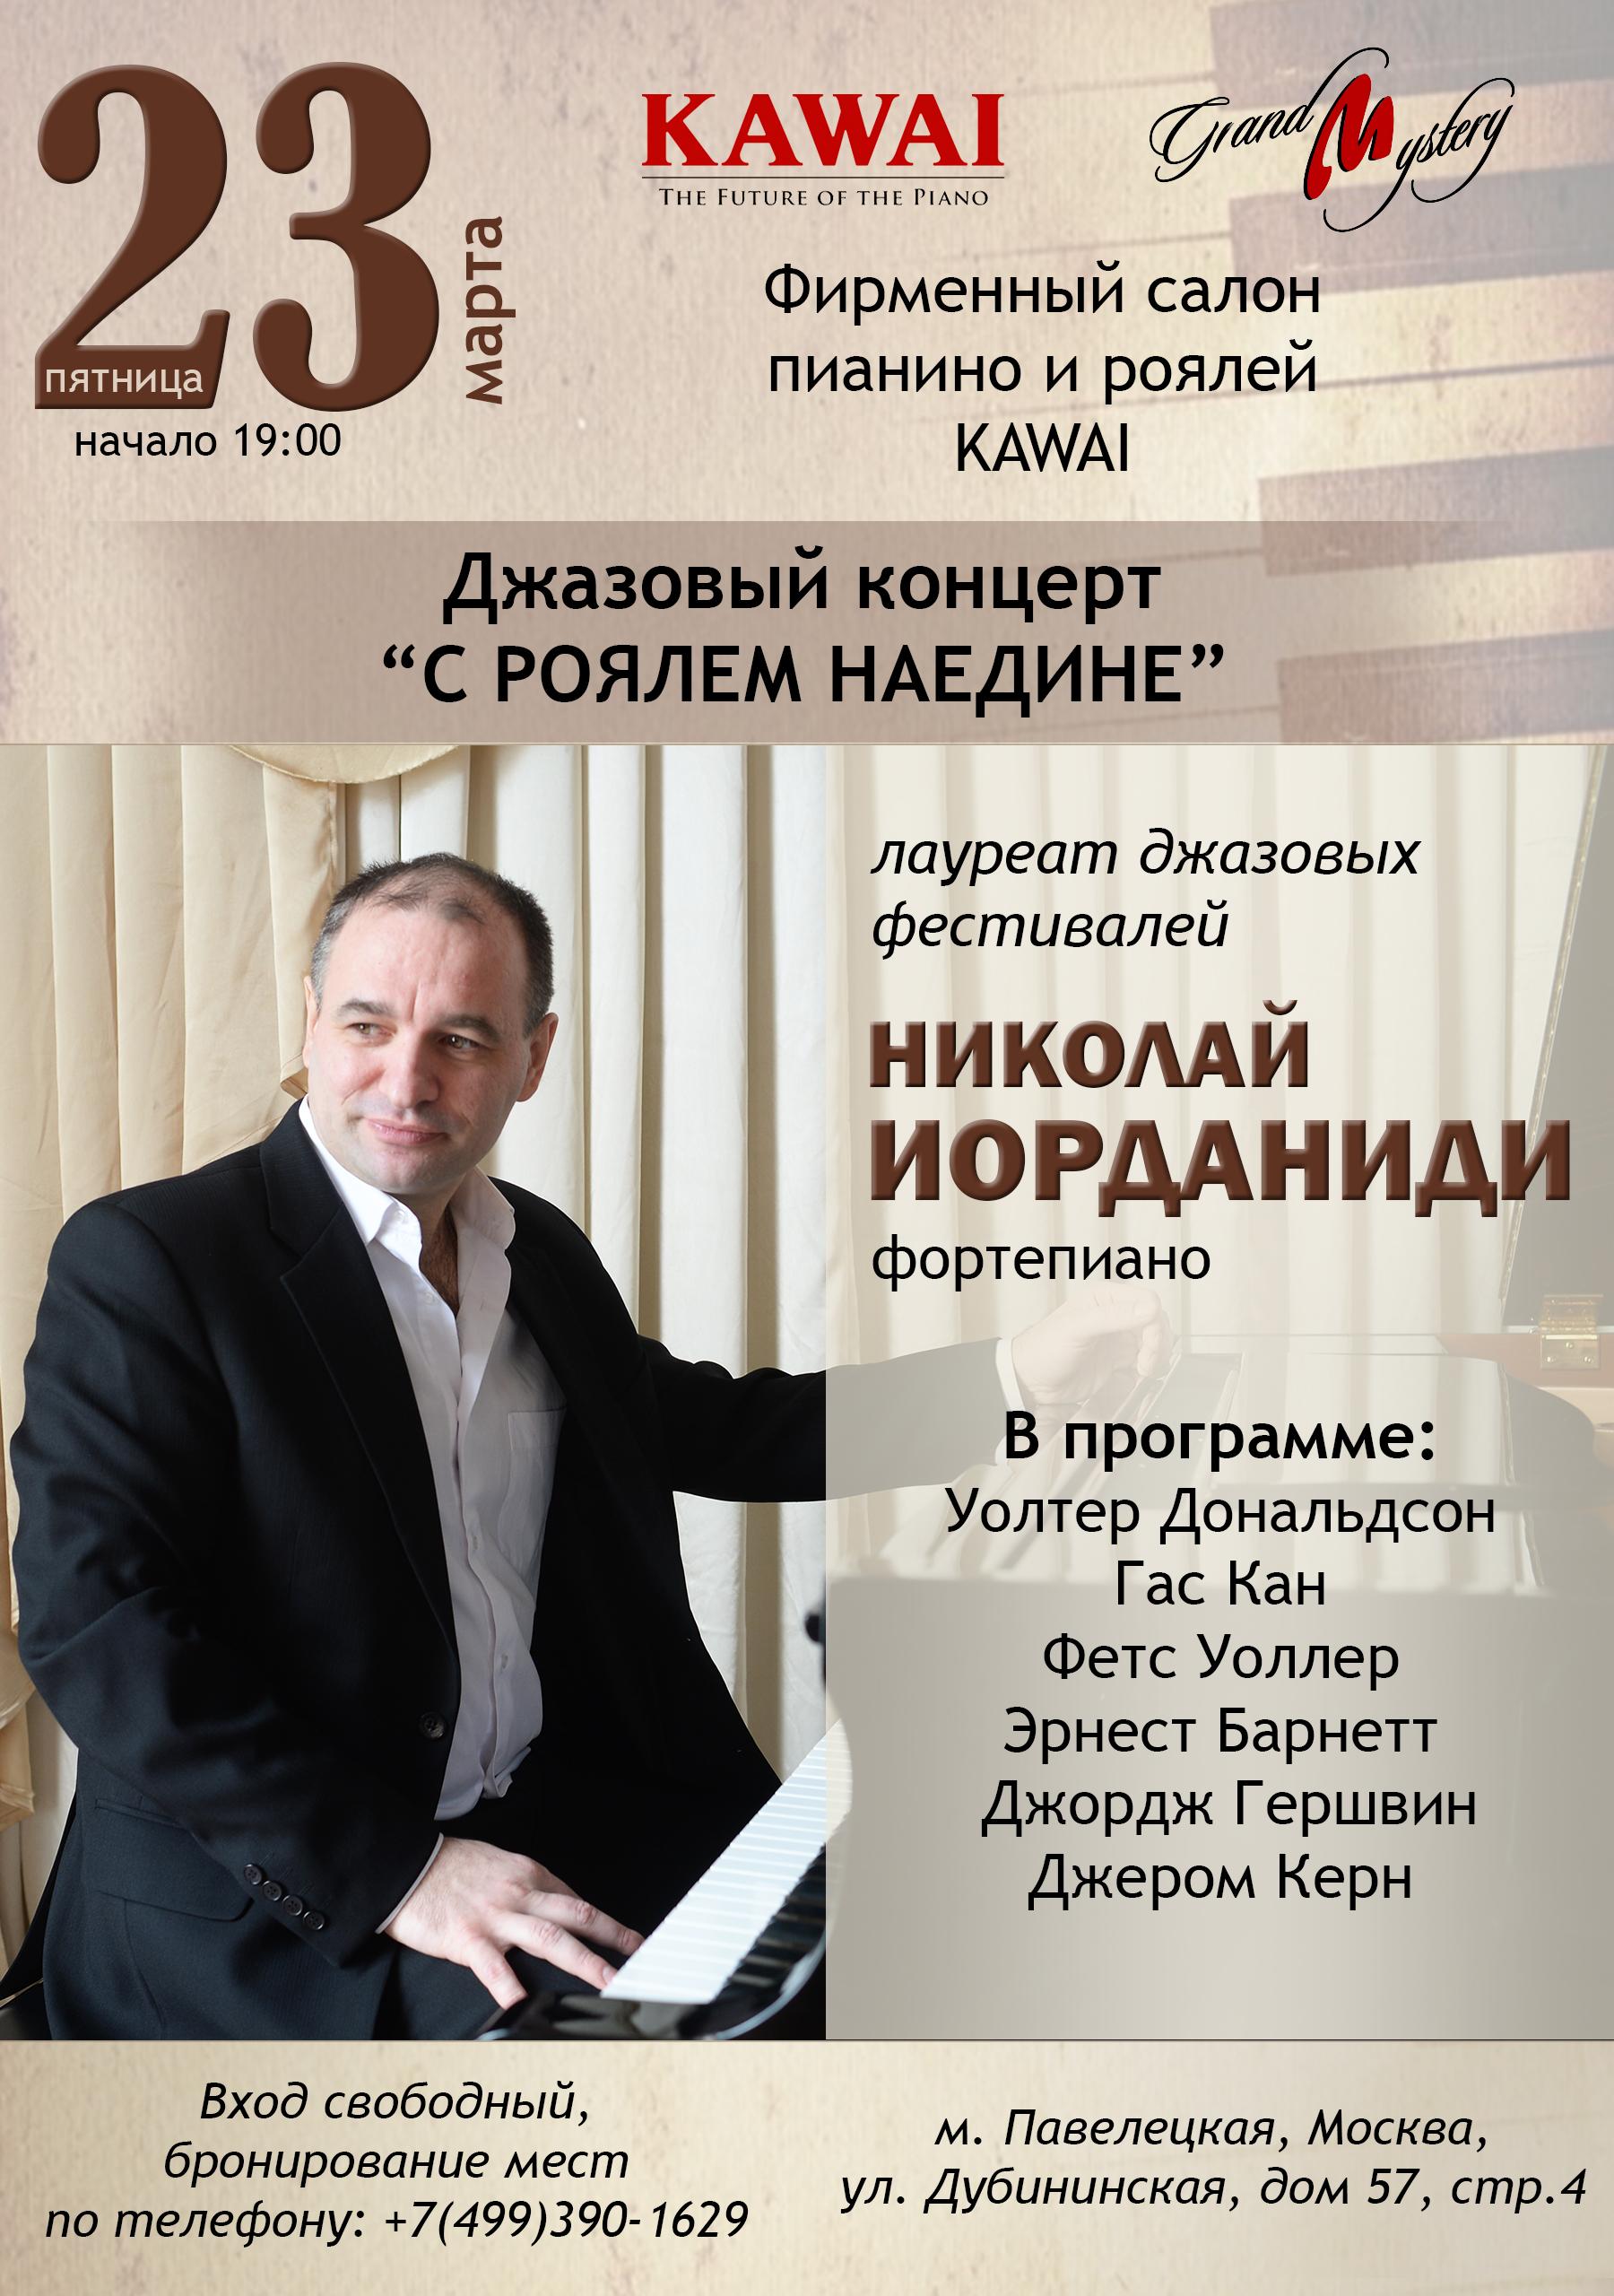 Николай Иорданиди - с роялем наедине